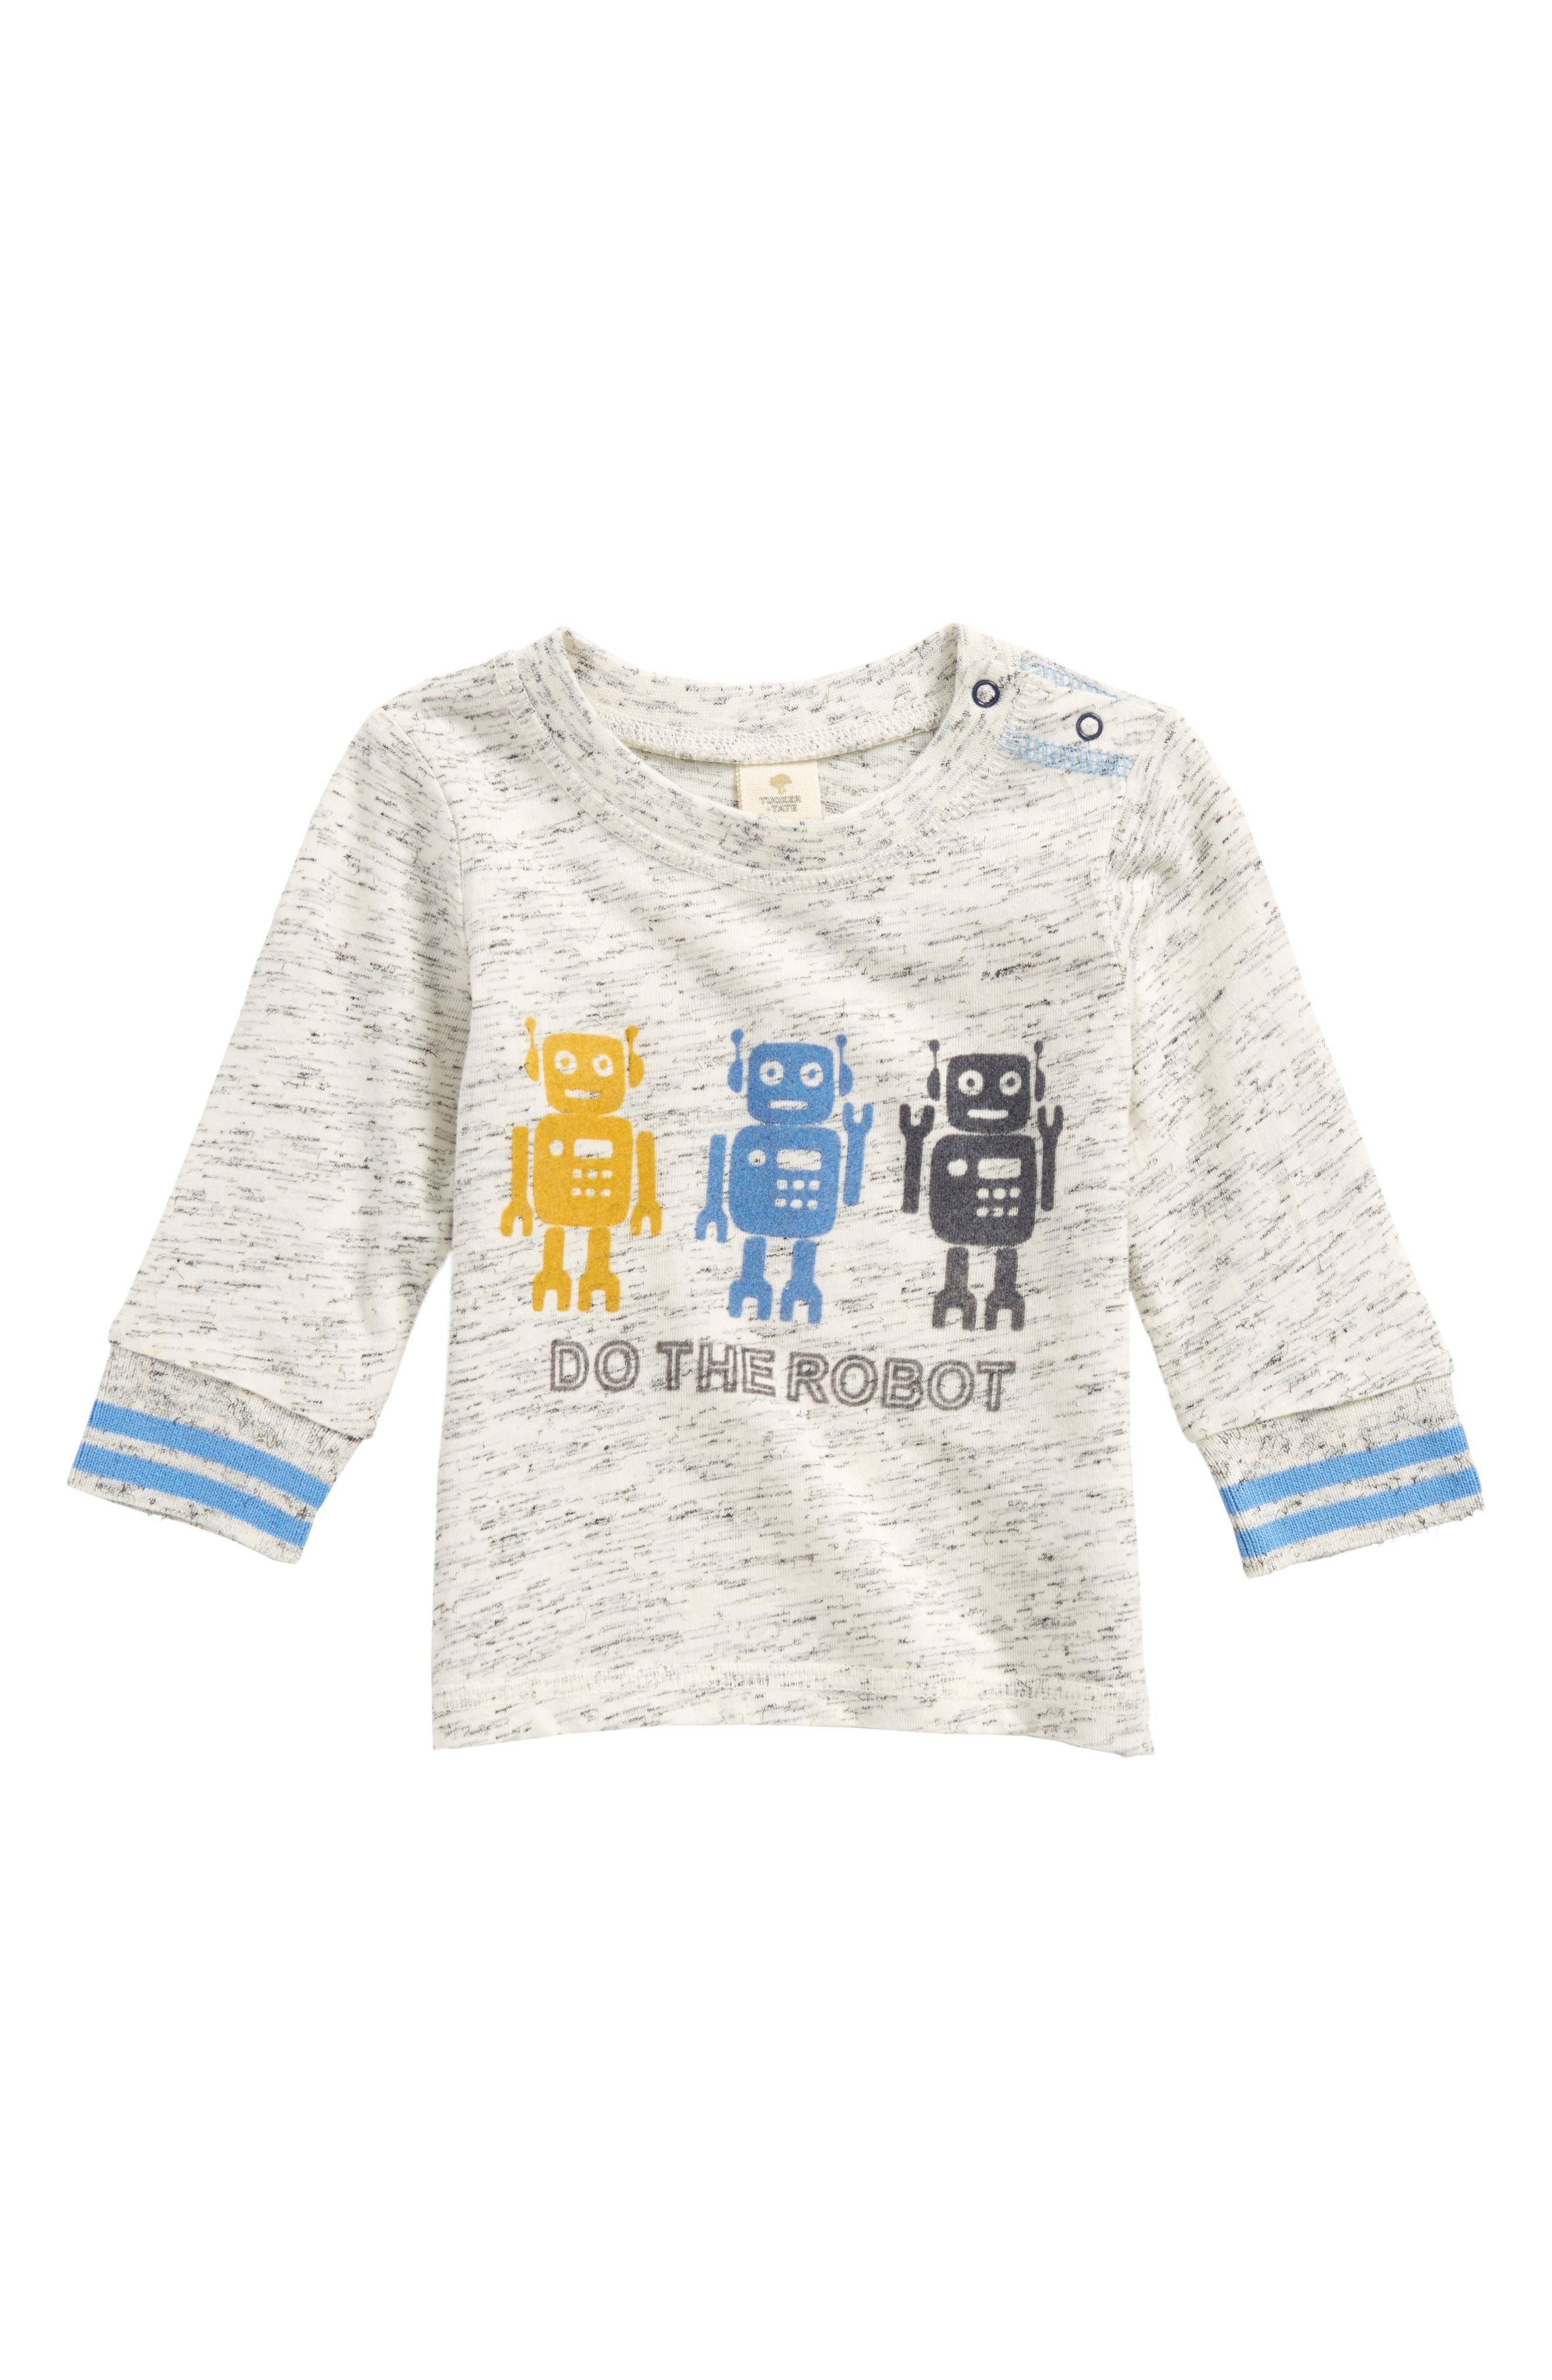 Tucker + Tate Robot T-Shirt (Baby Boys)